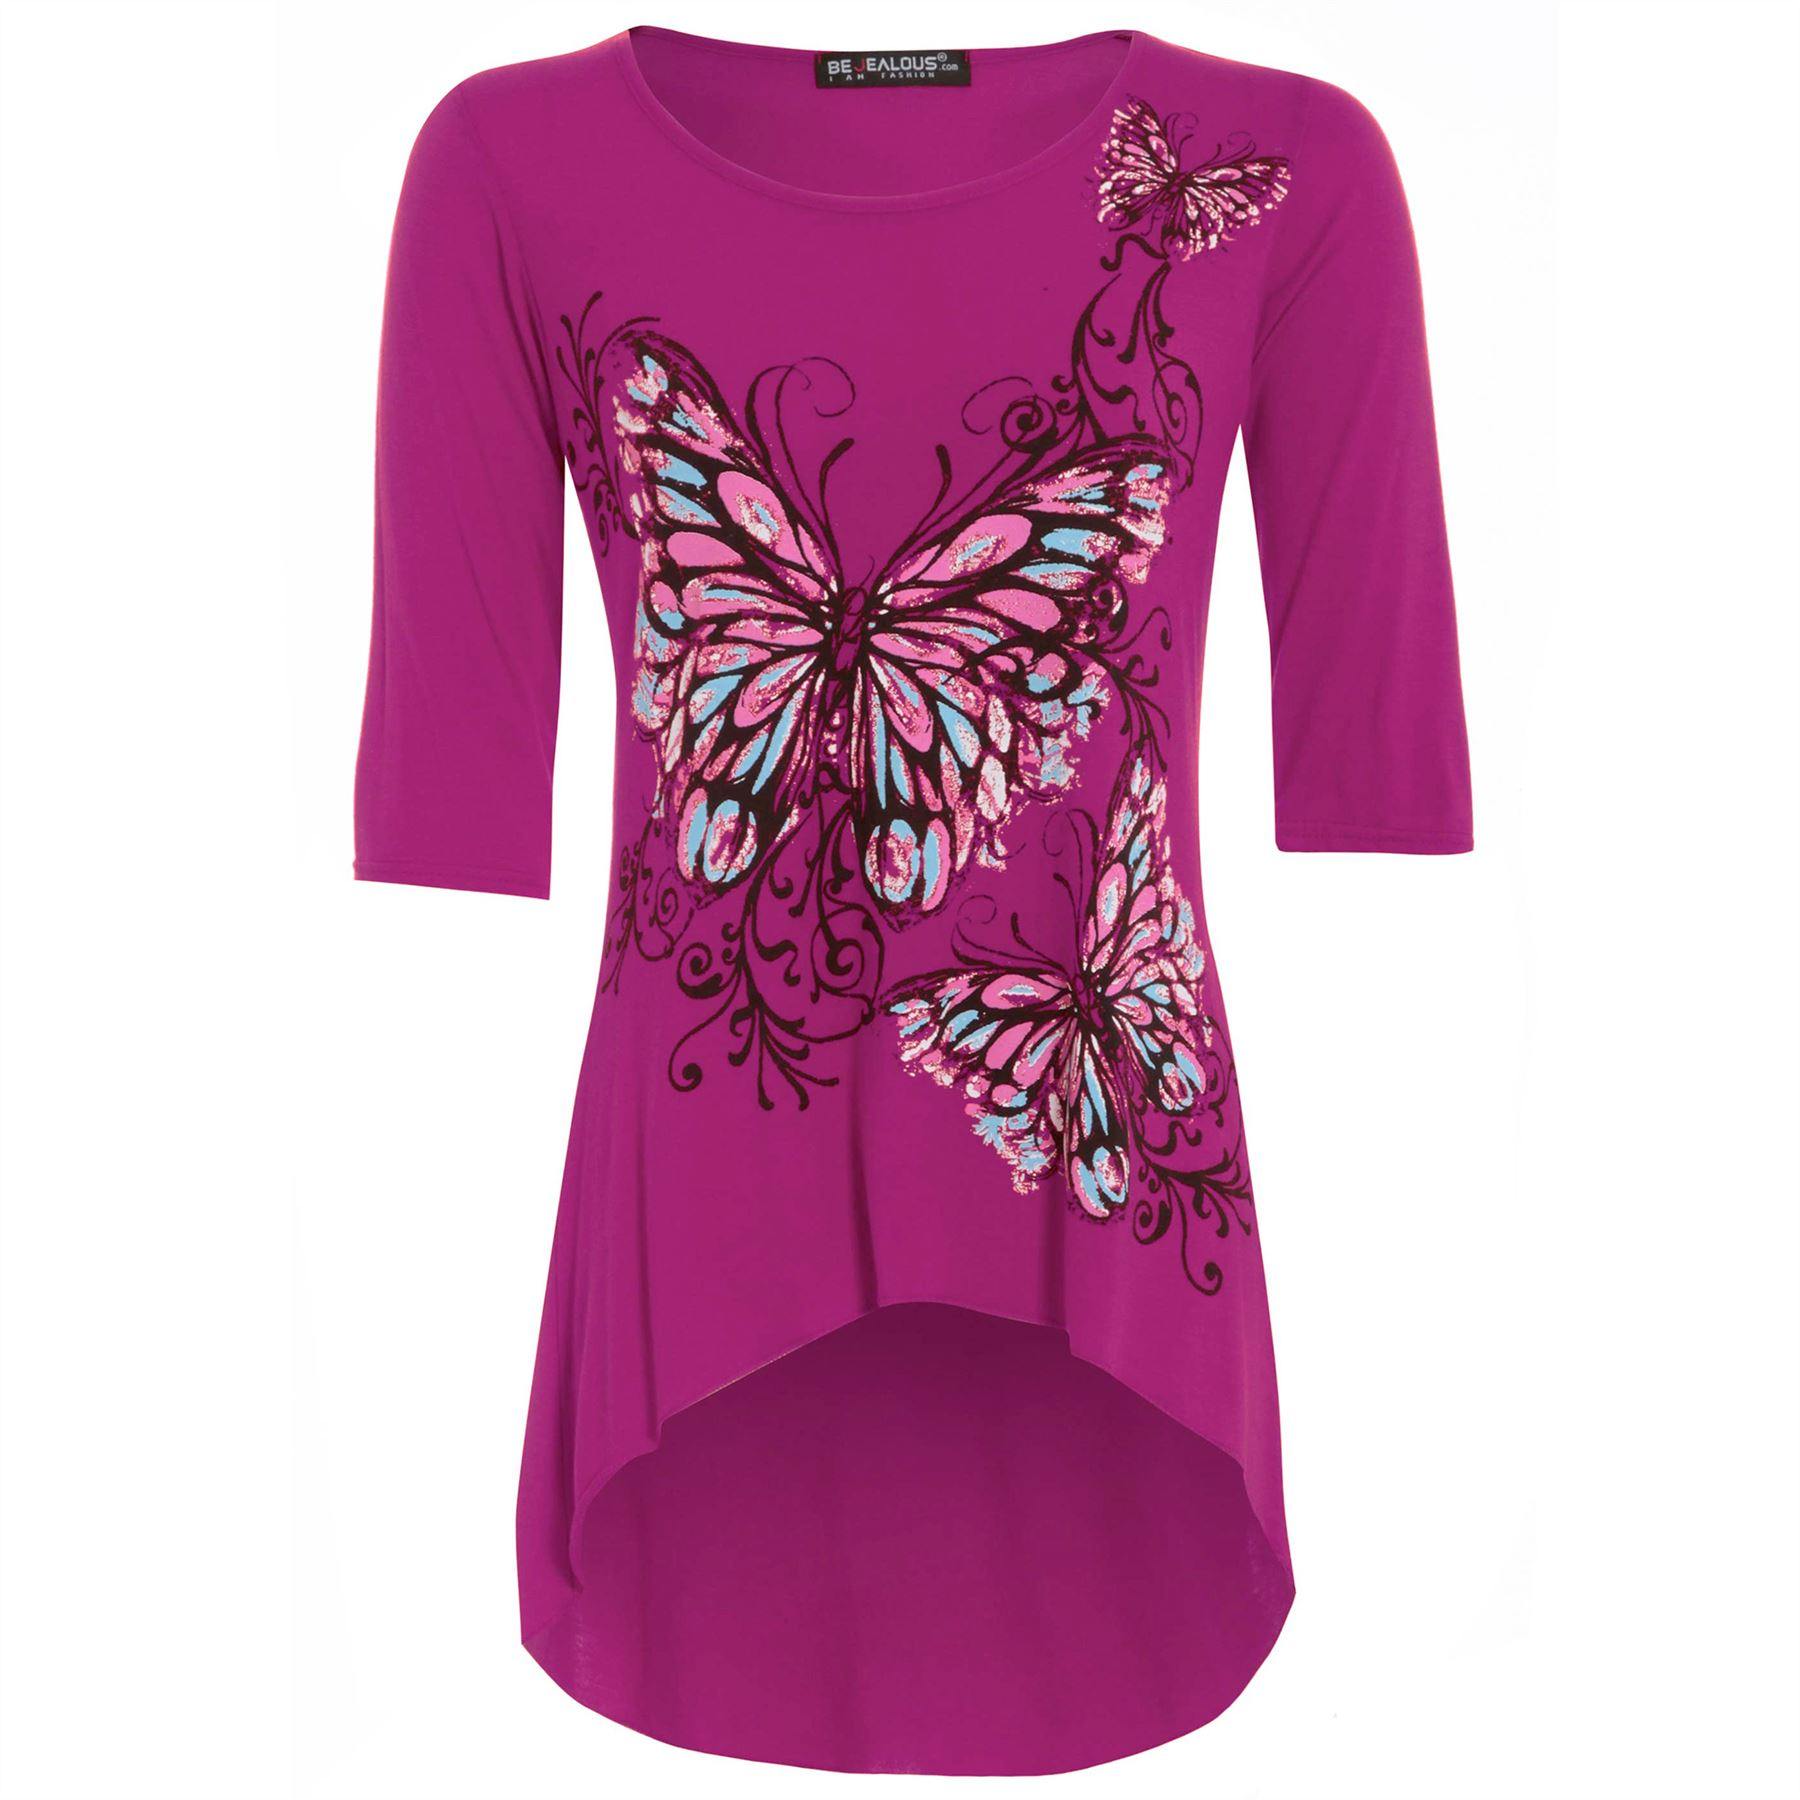 Womens-High-Low-Top-Ladies-3-4-Sleeves-Butterfly-Print-Dip-Hem-Tunic-Plus-Size